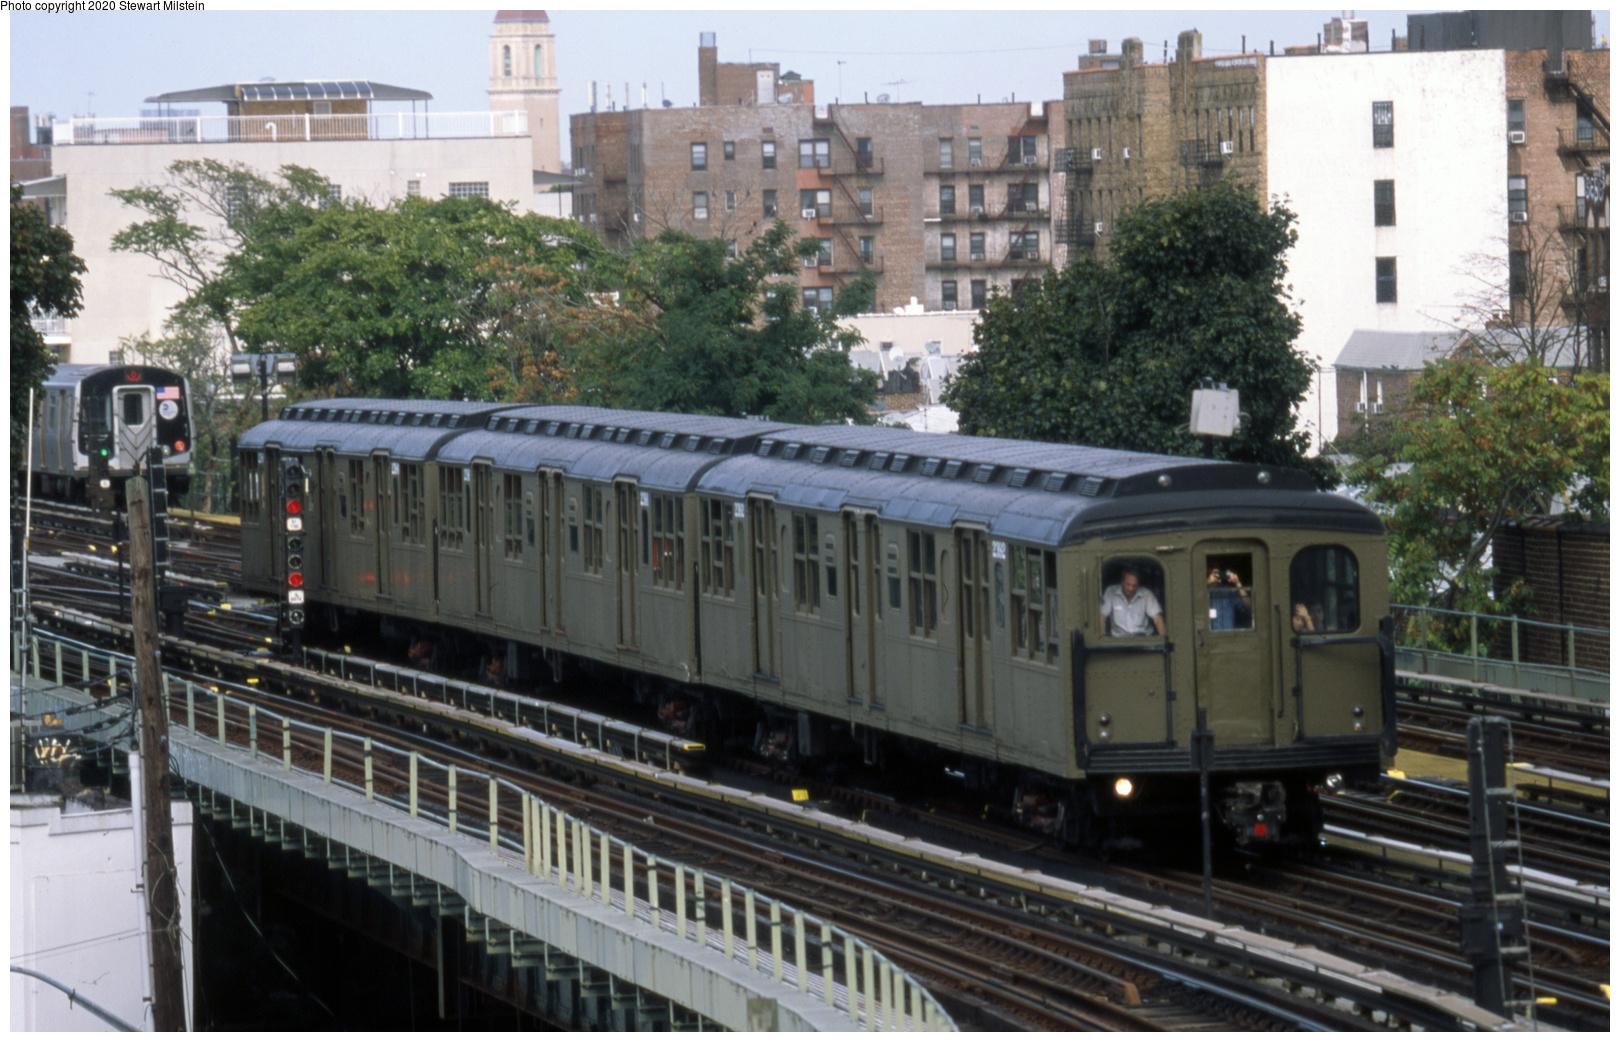 (687k, 1620x1042)<br><b>Country:</b> United States<br><b>City:</b> New York<br><b>System:</b> New York City Transit<br><b>Line:</b> BMT Brighton Line<br><b>Location:</b> Brighton Beach<br><b>Route:</b> Museum Train Service<br><b>Car:</b> BMT A/B-Type Standard 2392 <br><b>Photo by:</b> Stewart Milstein<br><b>Date:</b> 9/28/2019<br><b>Viewed (this week/total):</b> 0 / 172